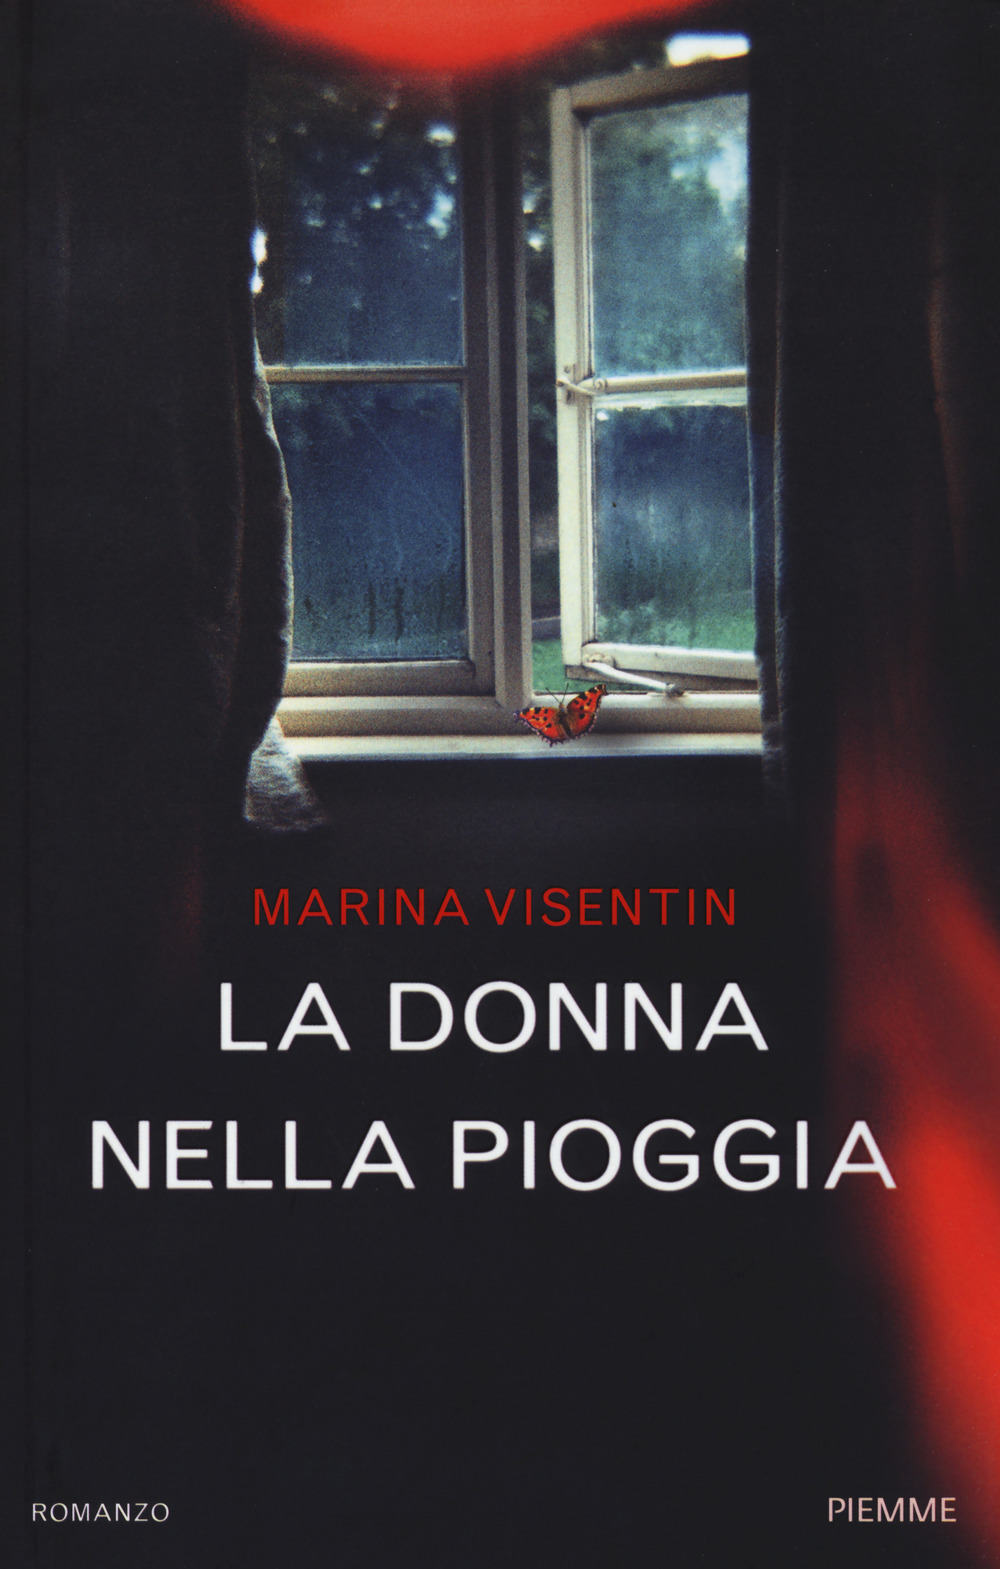 Marina Visentin